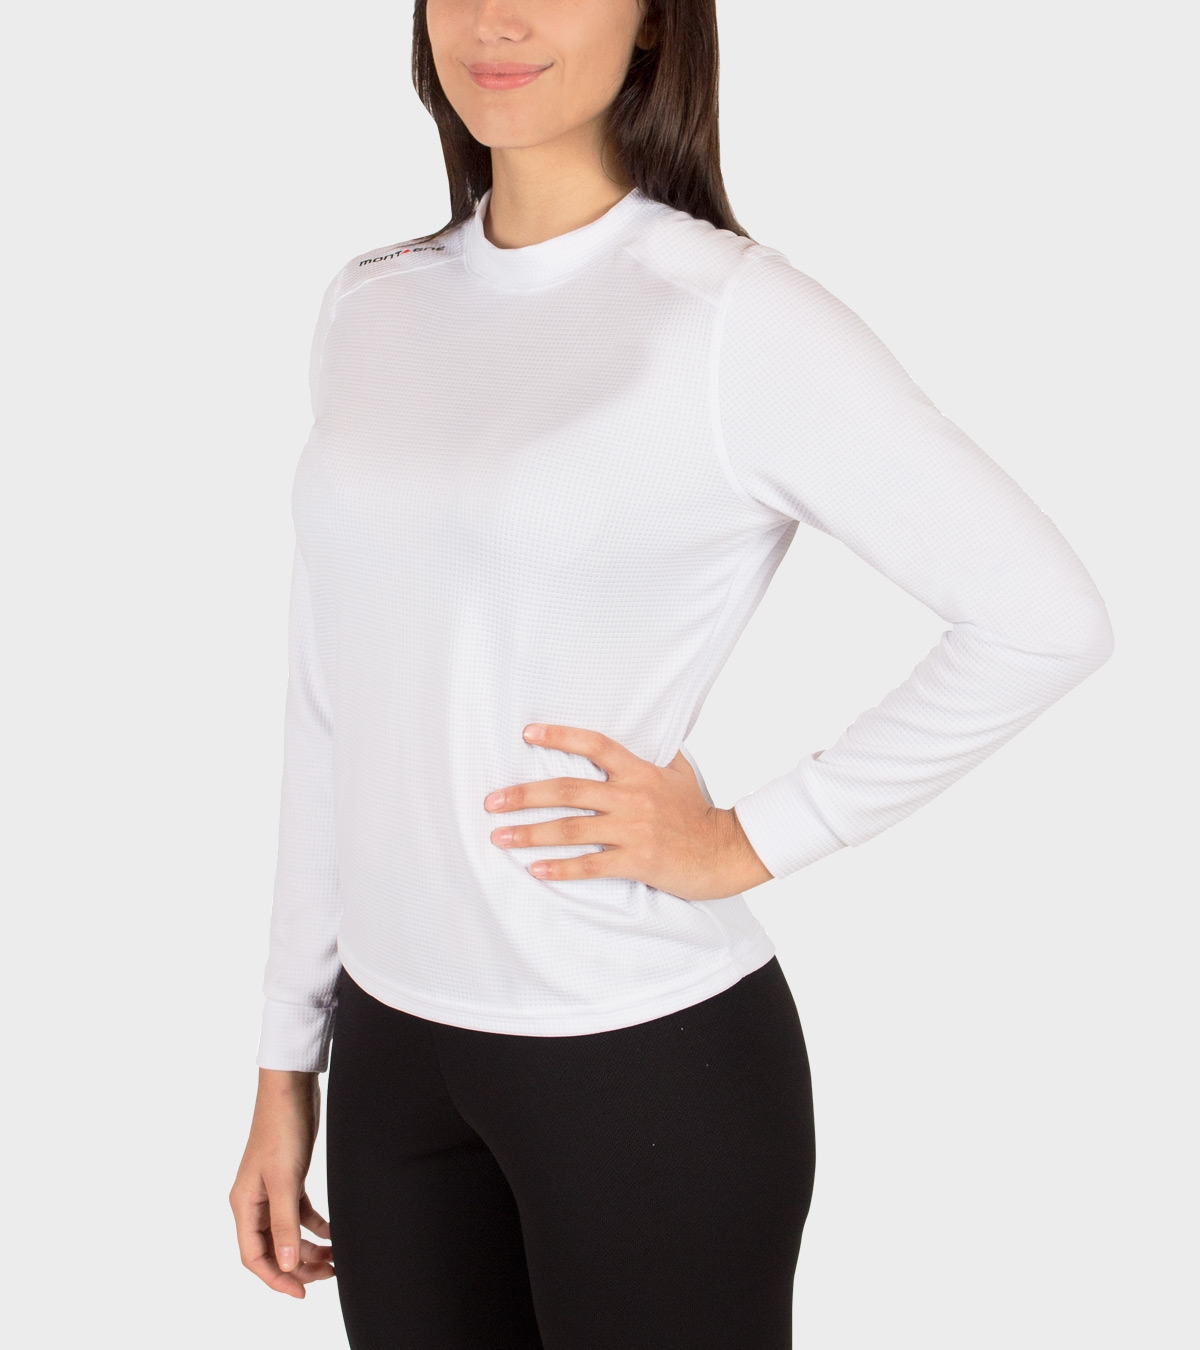 Camiseta Térmica de mujer Tamar